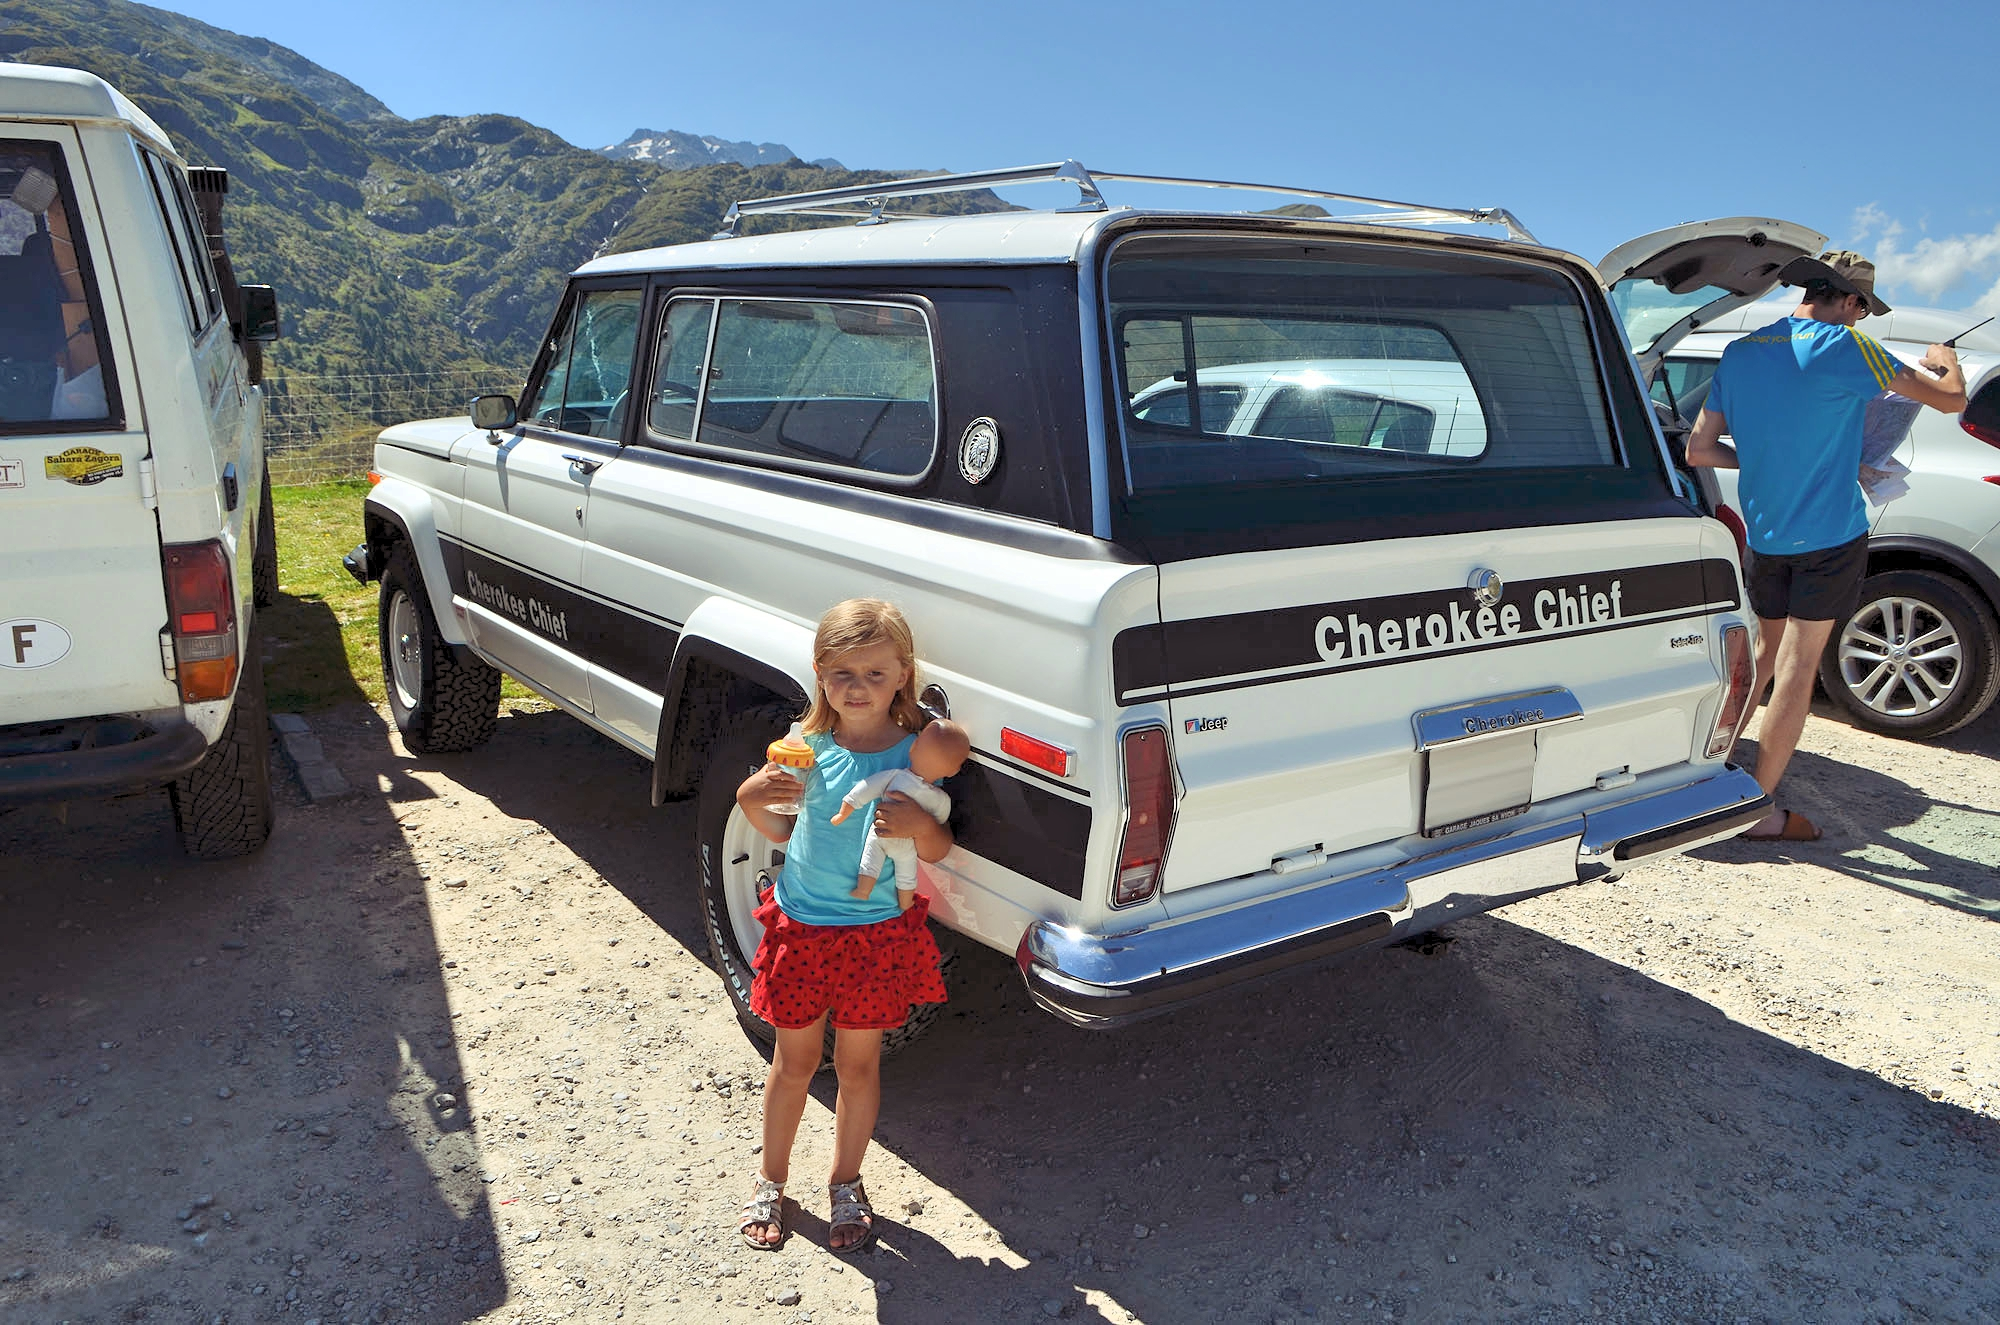 jeep-cherokee-chief-valloire-034.JPG